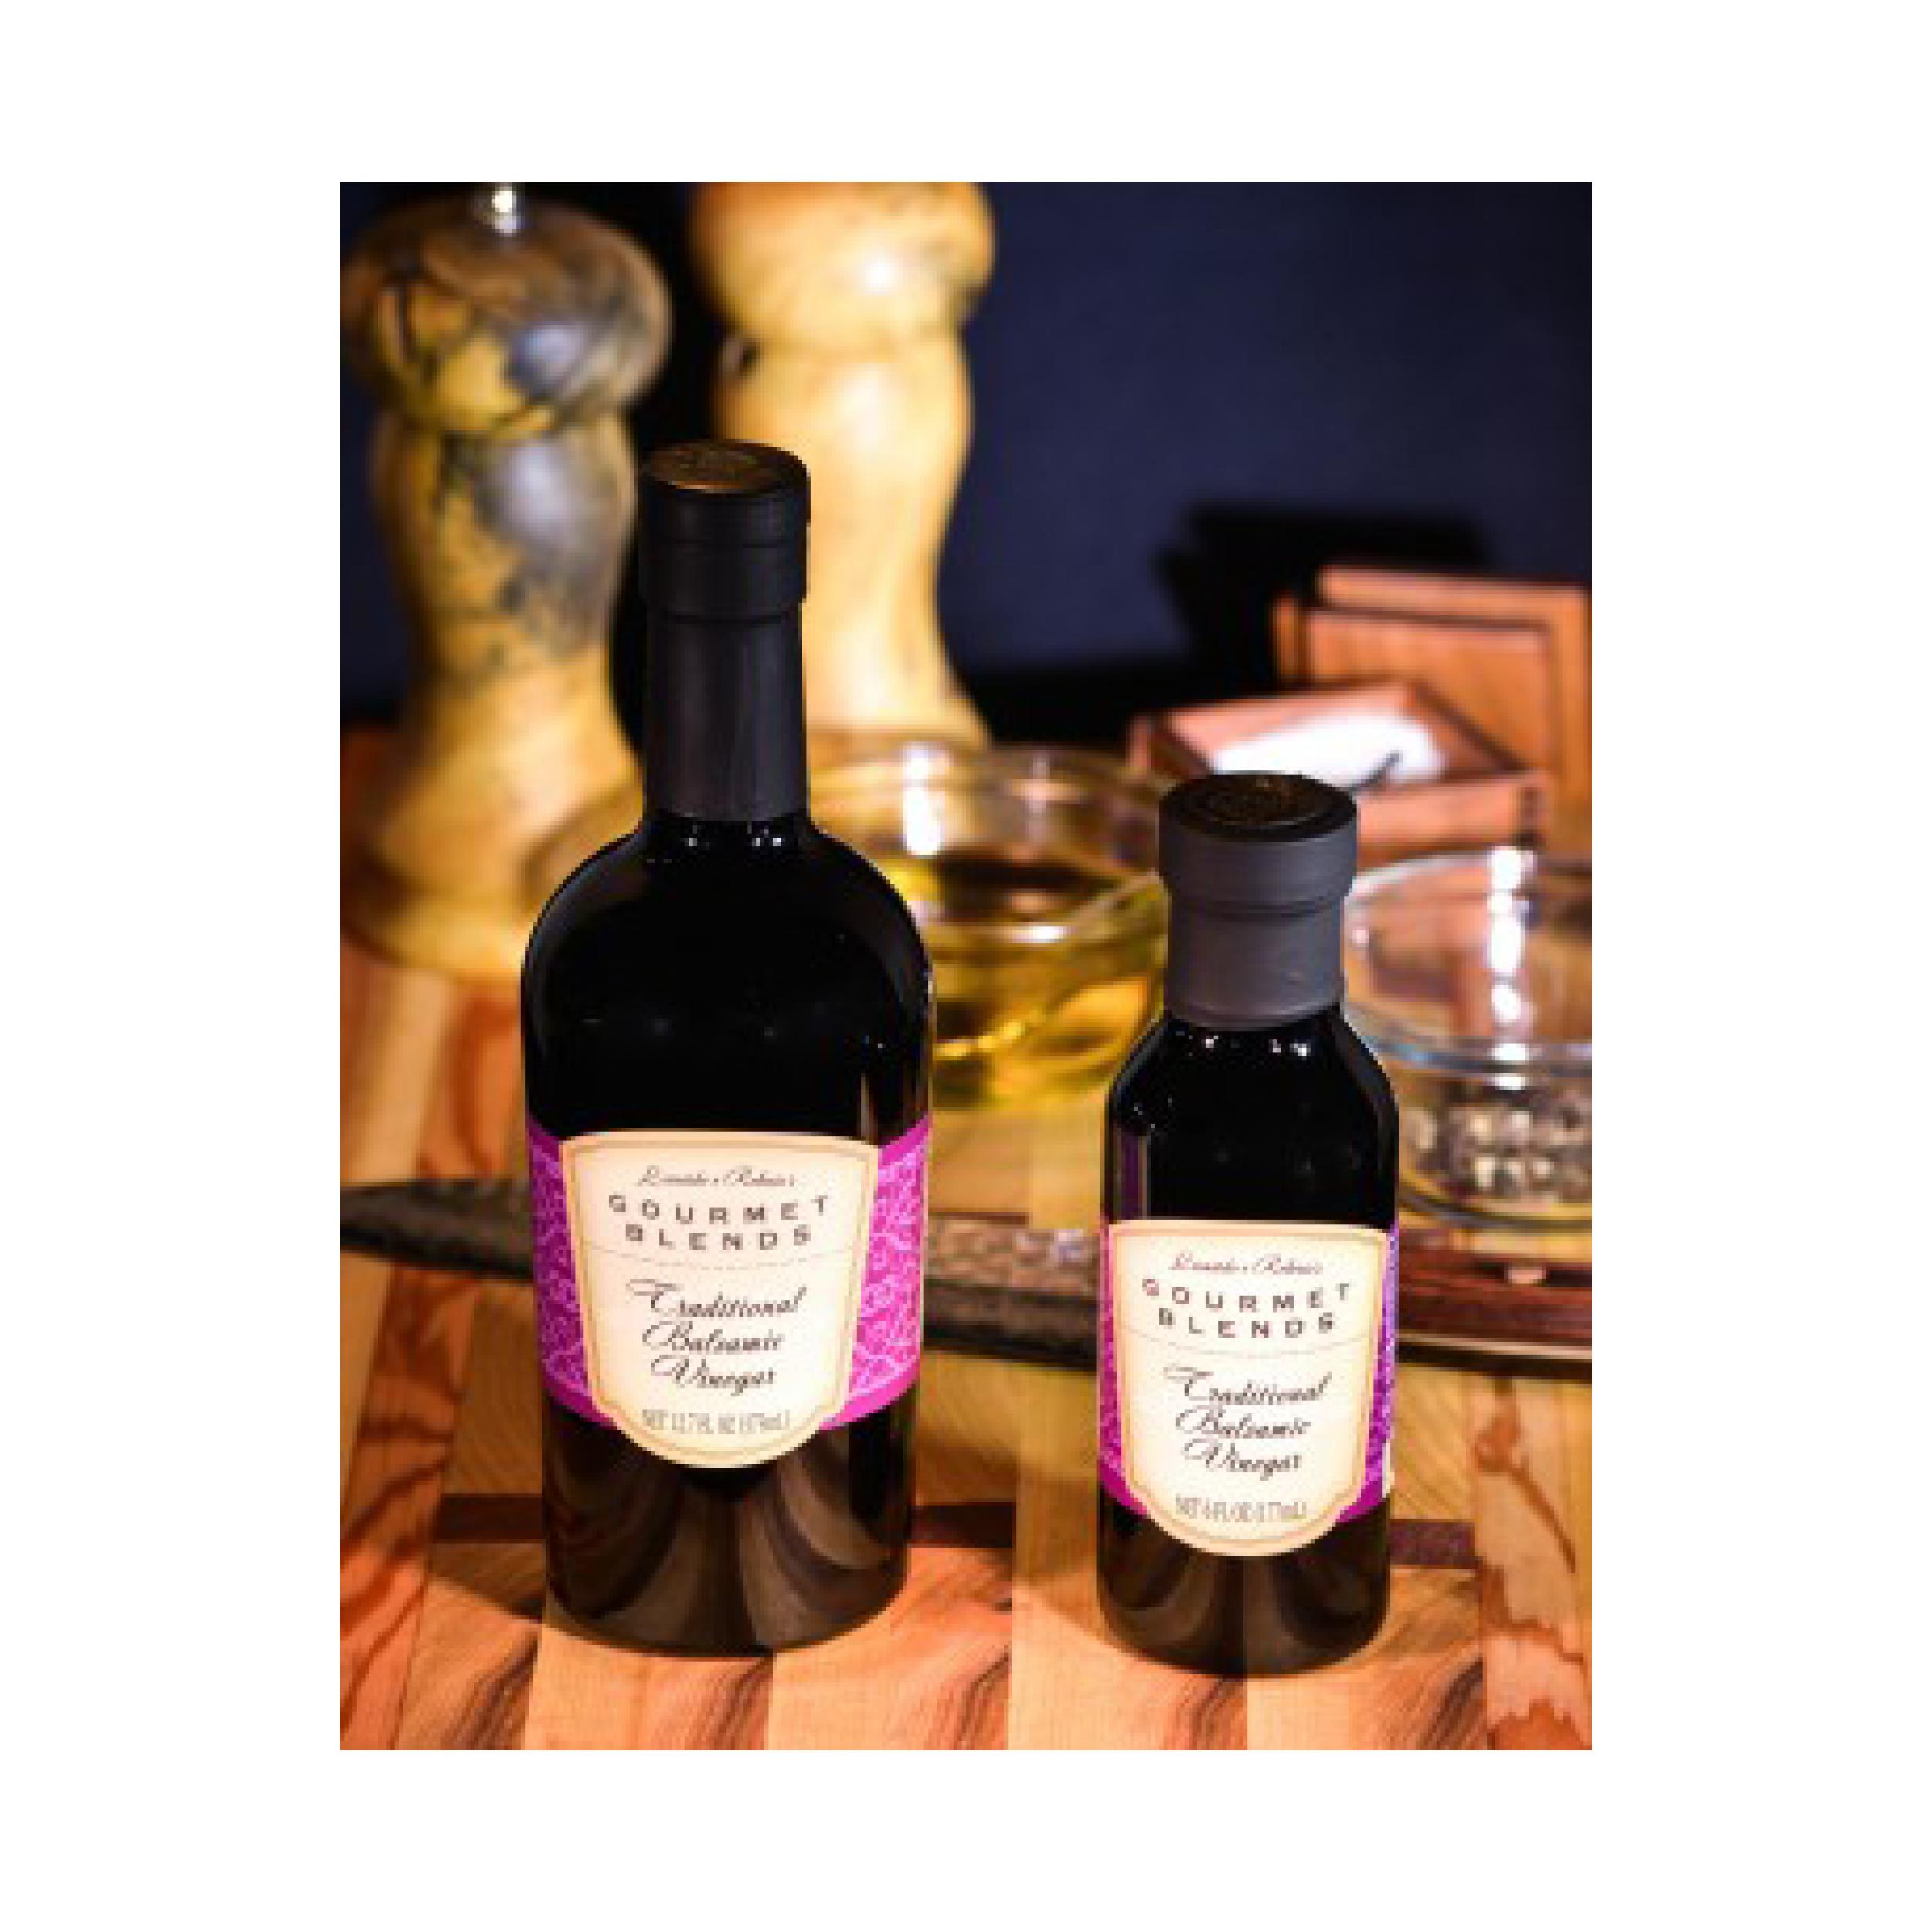 Gourmet Blends Traditional Balsamic Vinegar $36.00   Wants 1 Has 1 Needs 0